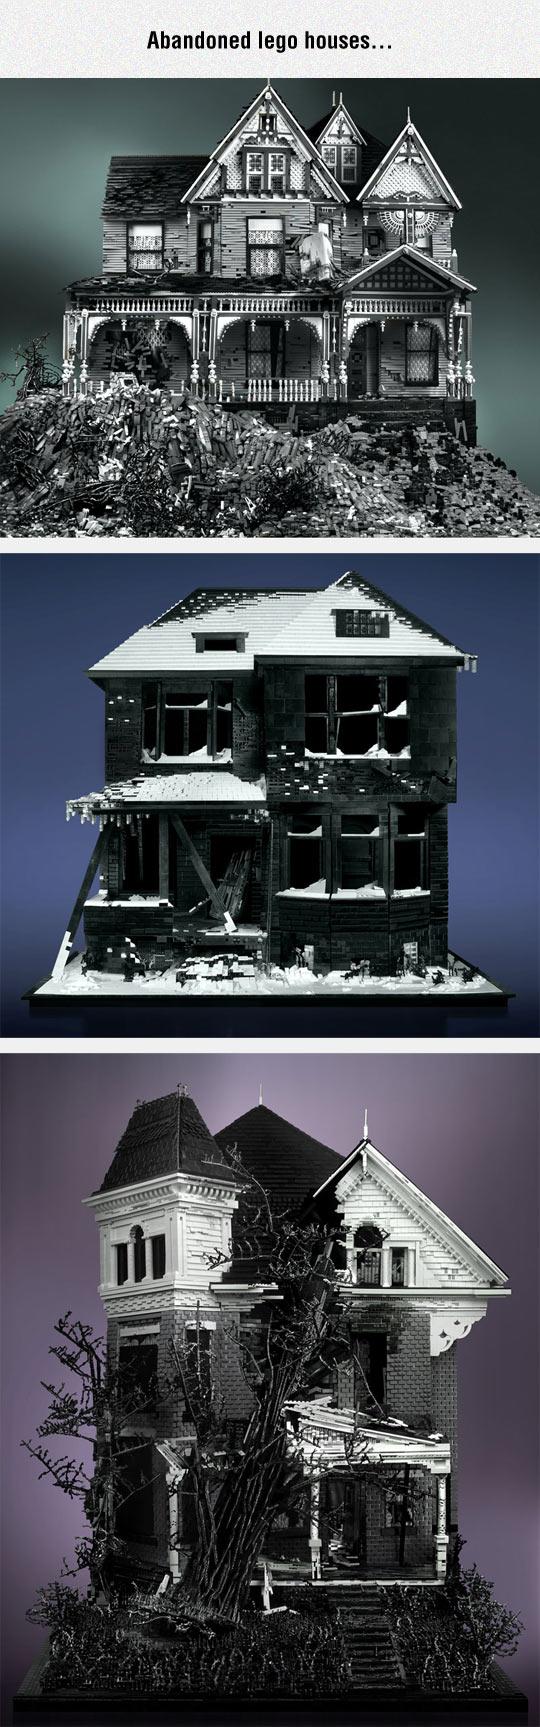 funny-Lego-abandoned-houses-haunted